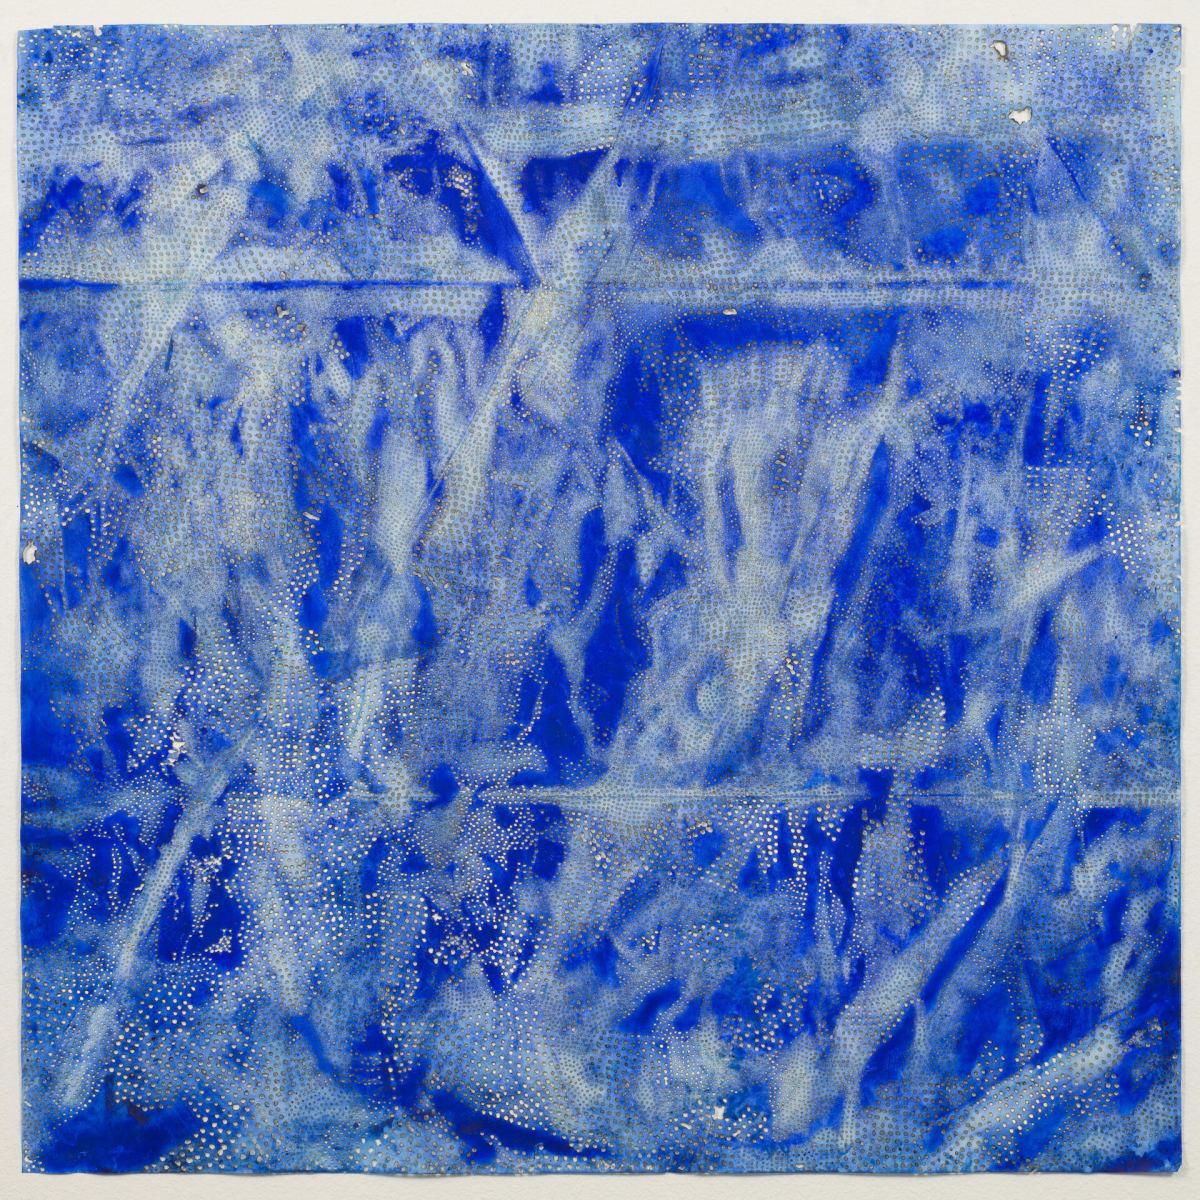 Jay McCafferty, Blue 20, 2015